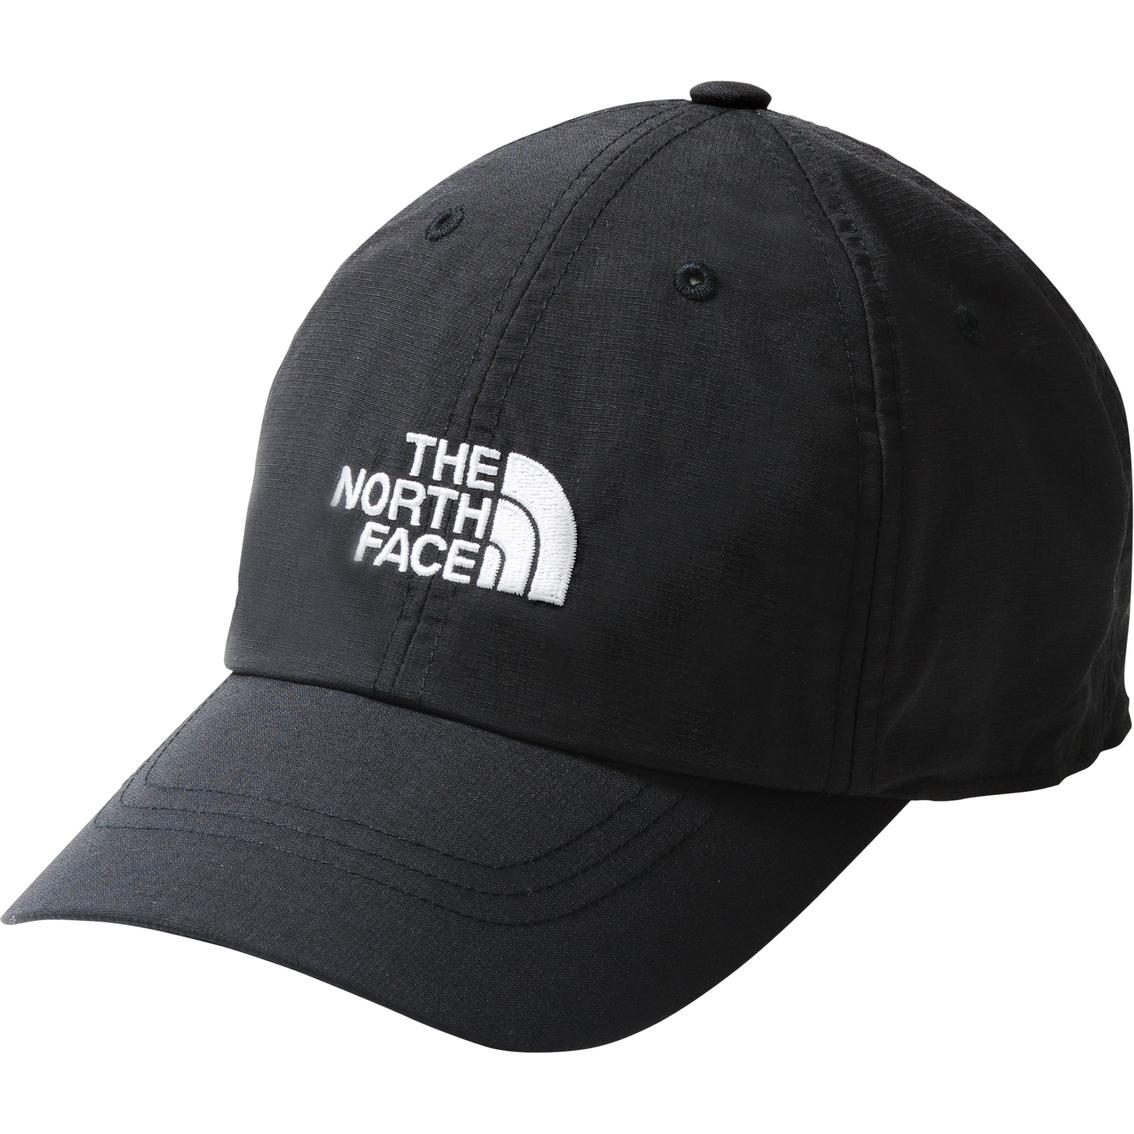 The North Face Horizon Ball Cap Ball Caps Amp Hats